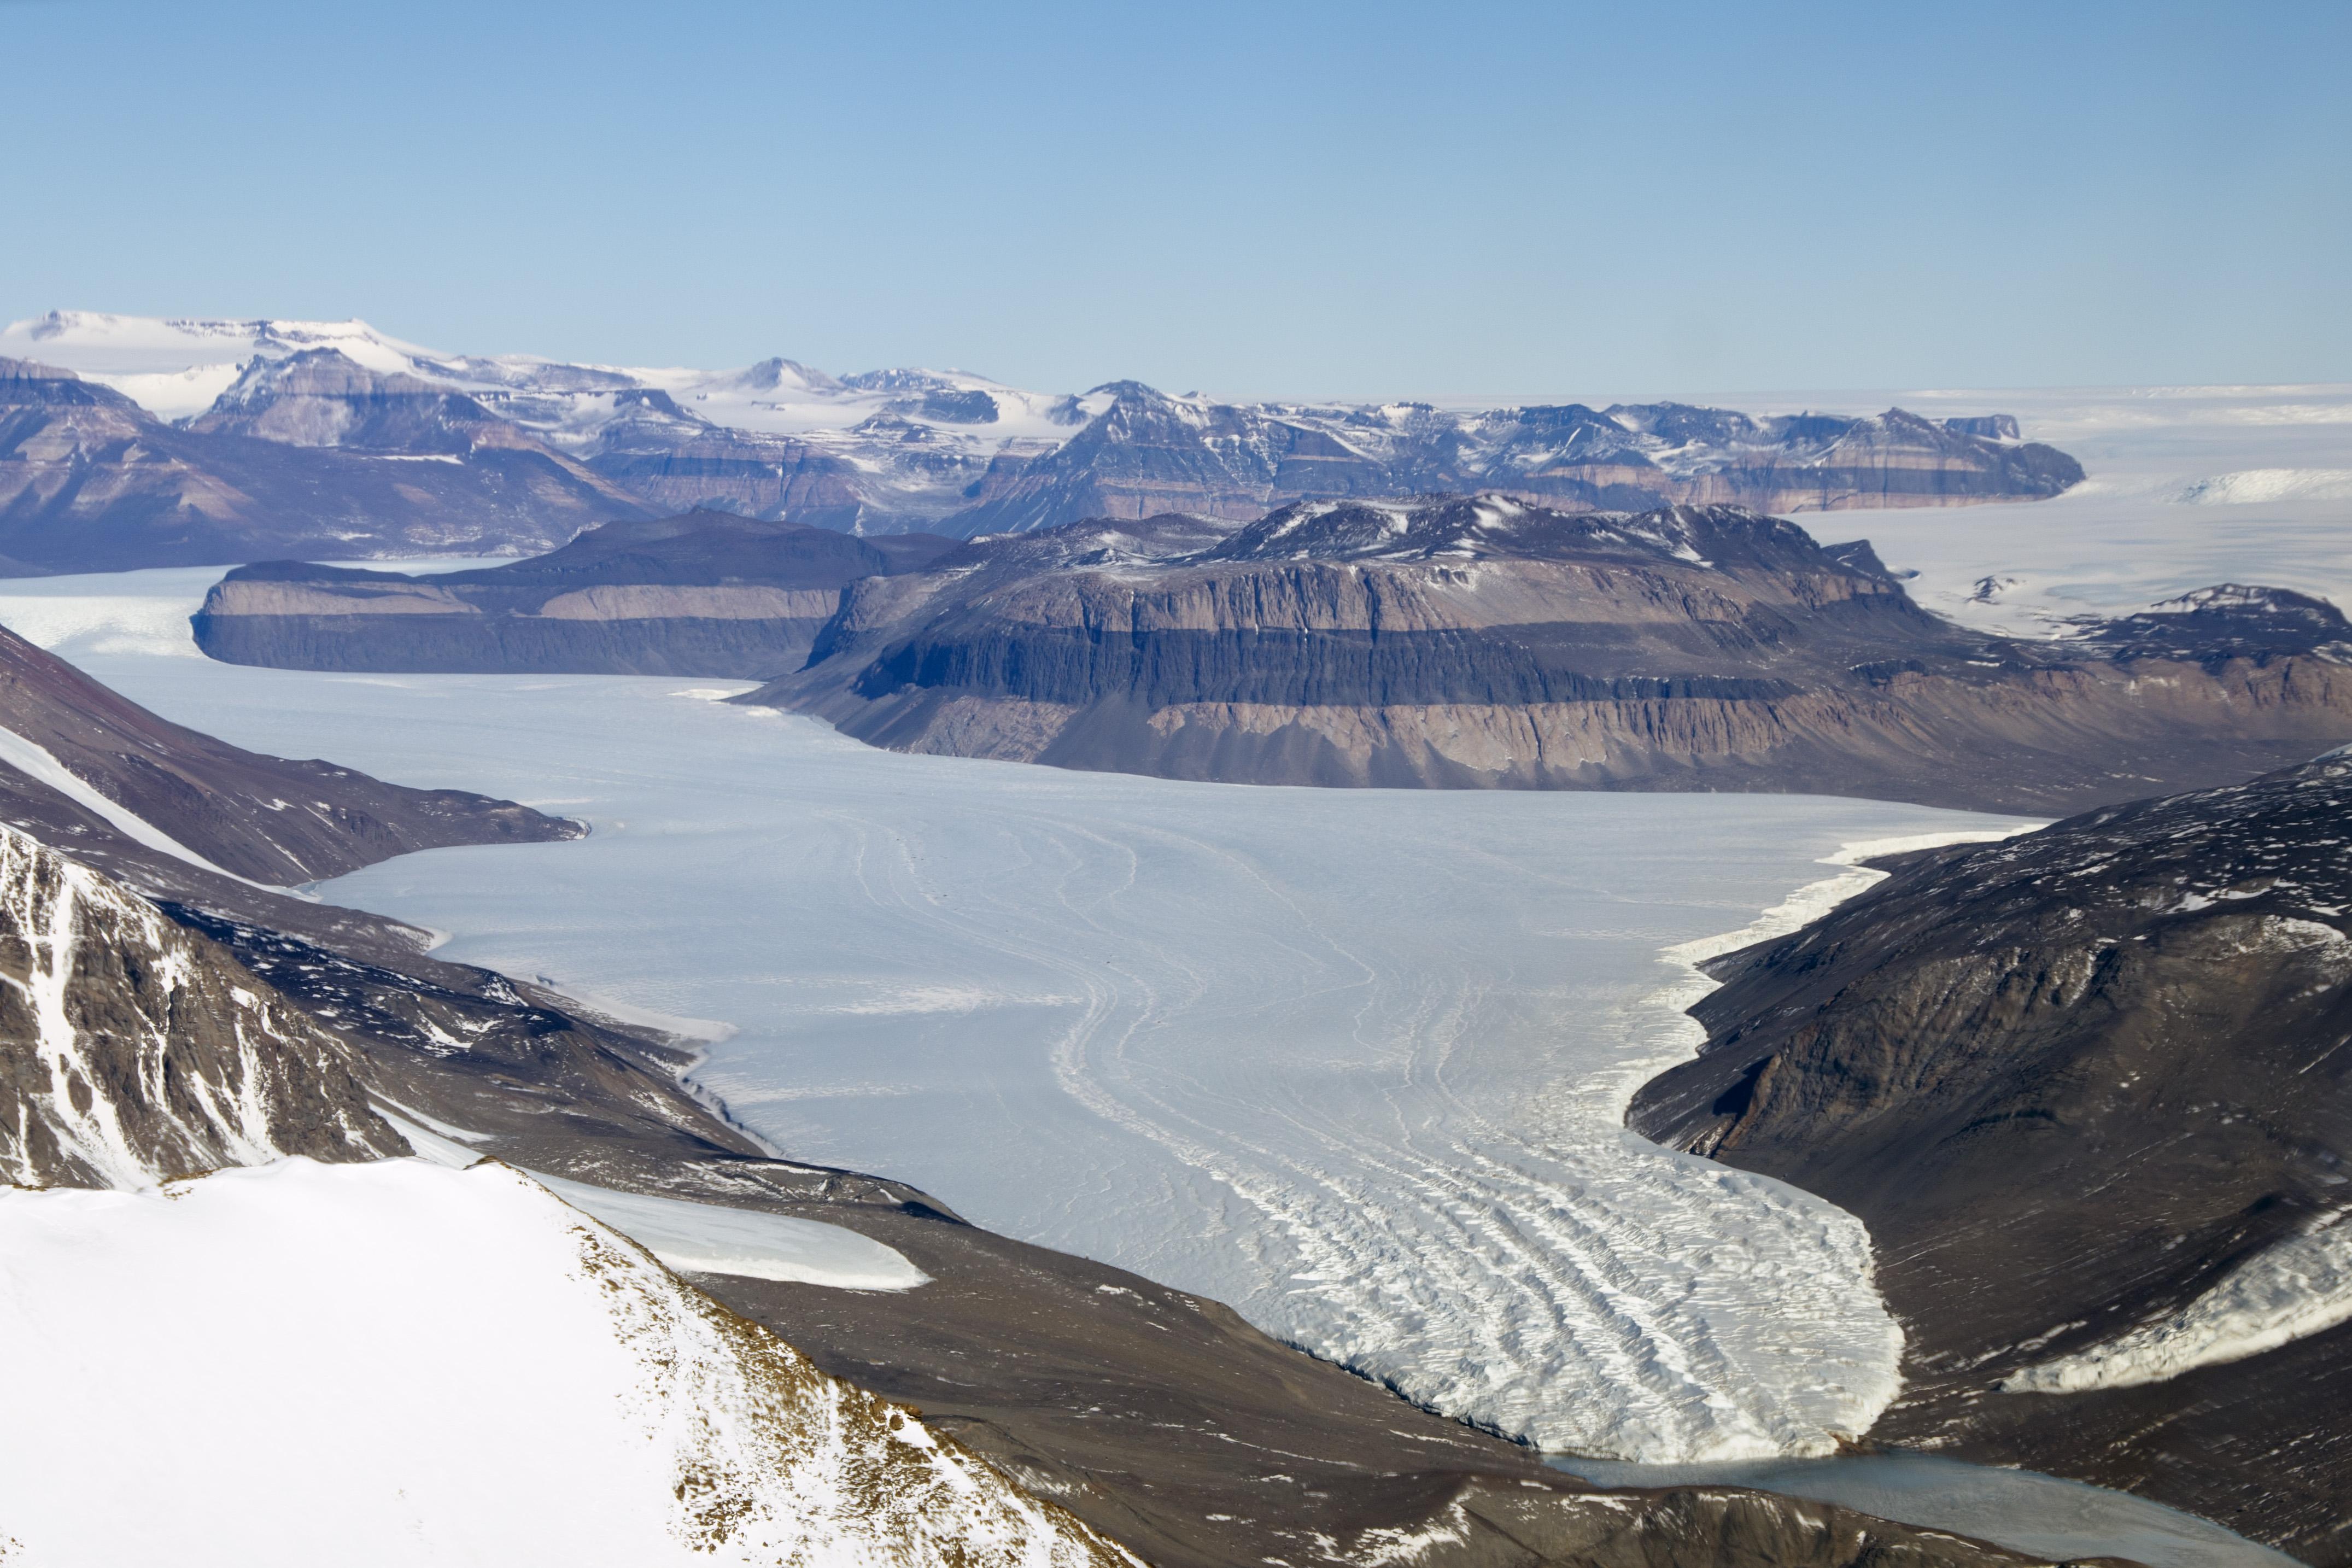 dry valley antarctica க்கான பட முடிவு